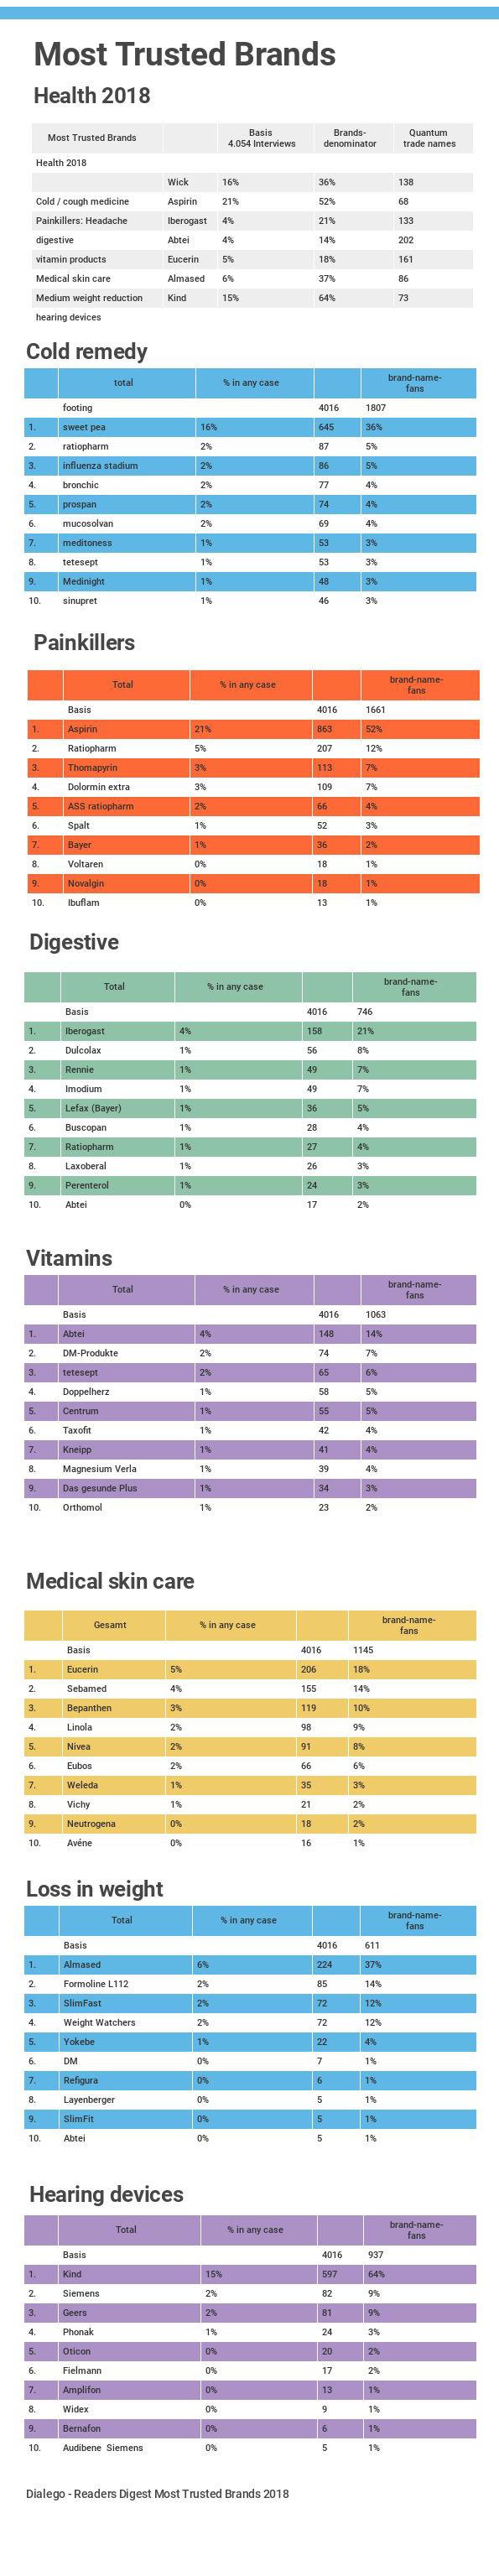 Most Trusted Brands Gesundheit 2018 - alle Kategorien